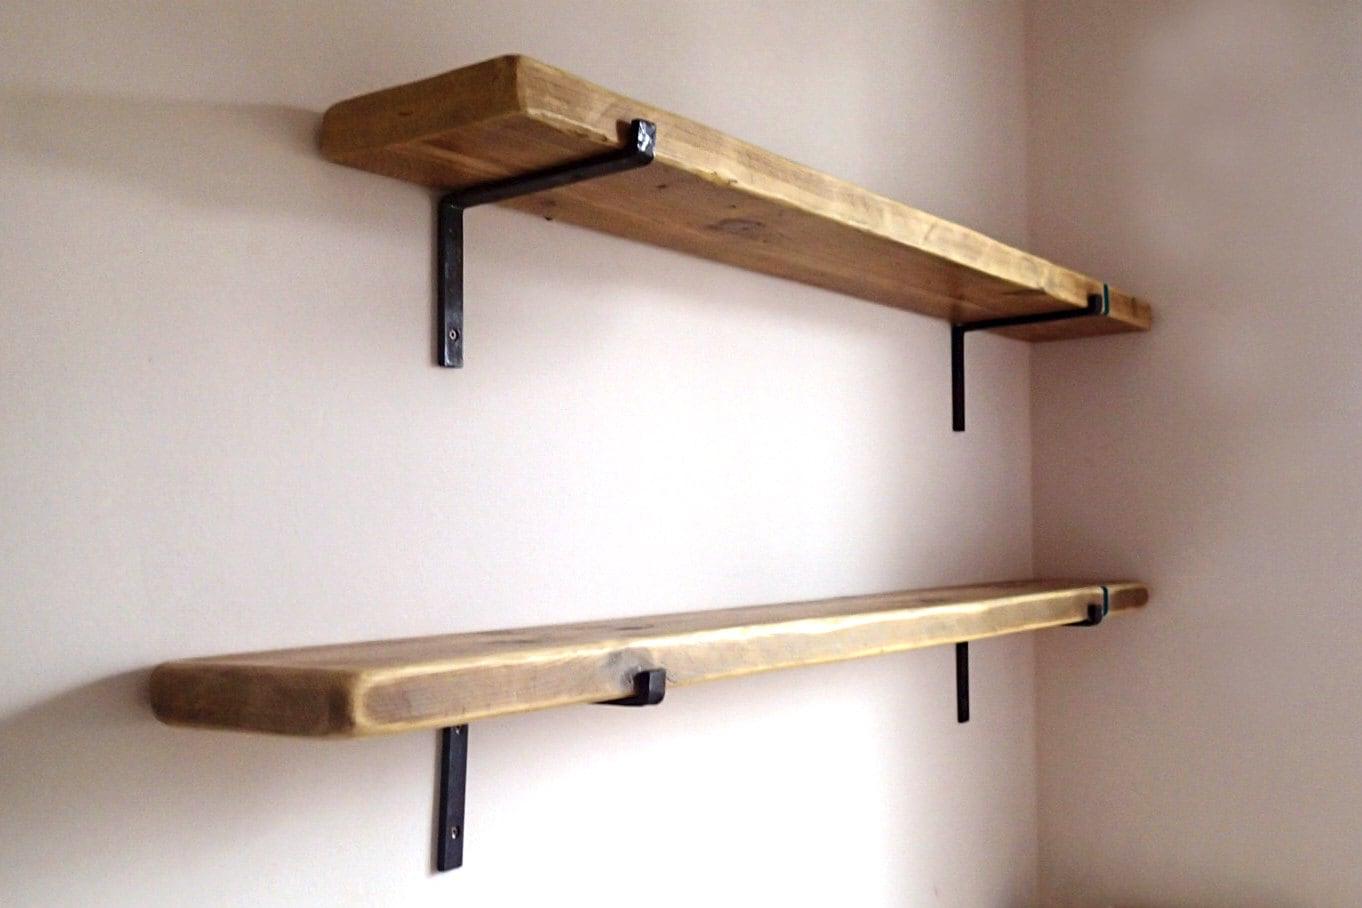 9 Deep Reclaimed Wood Shelves With 2 Iron Brackets